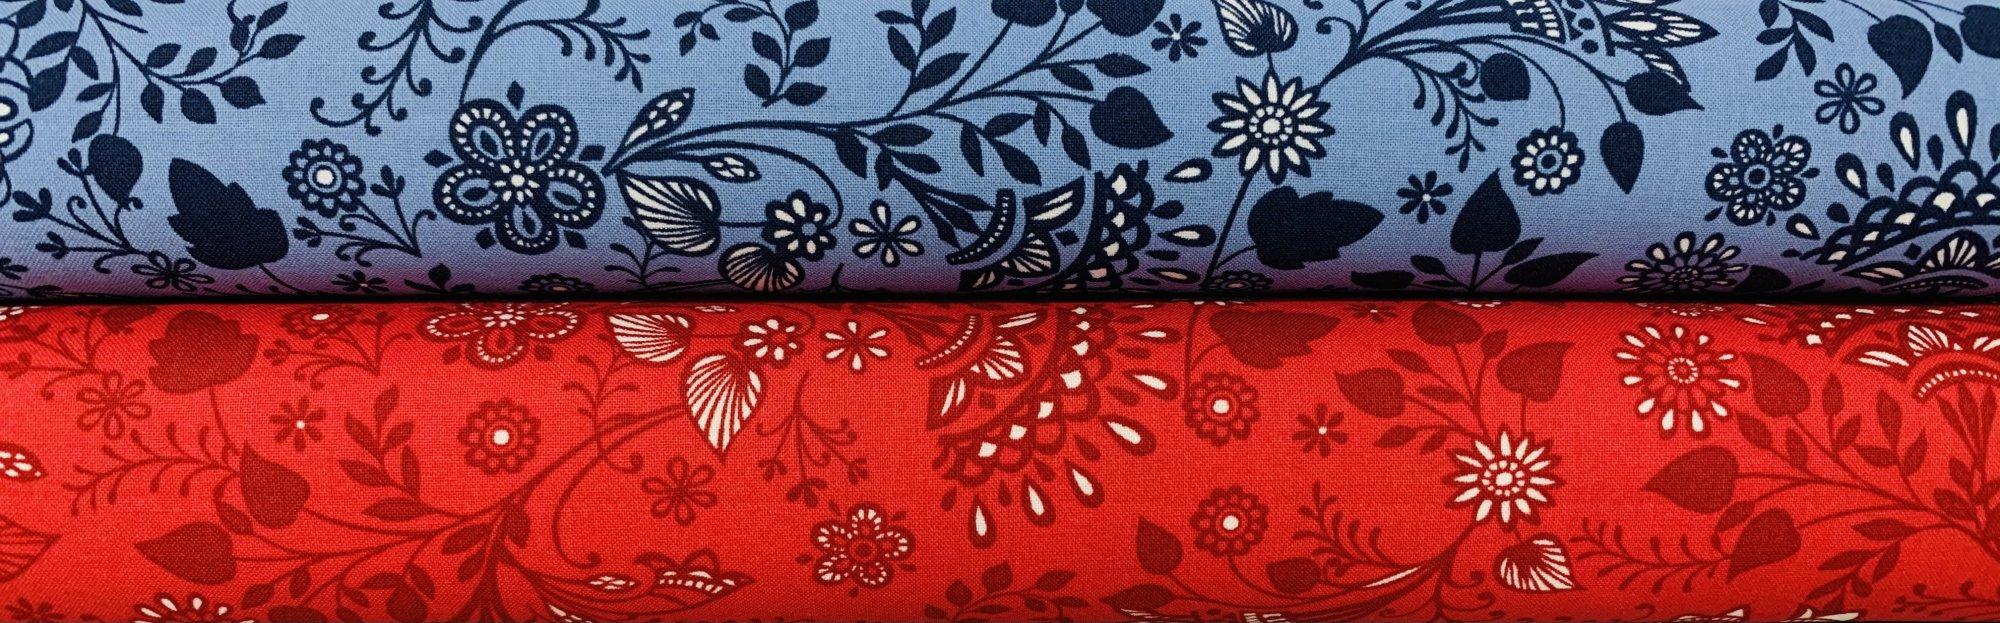 Apple Pie by Andover Fabrics